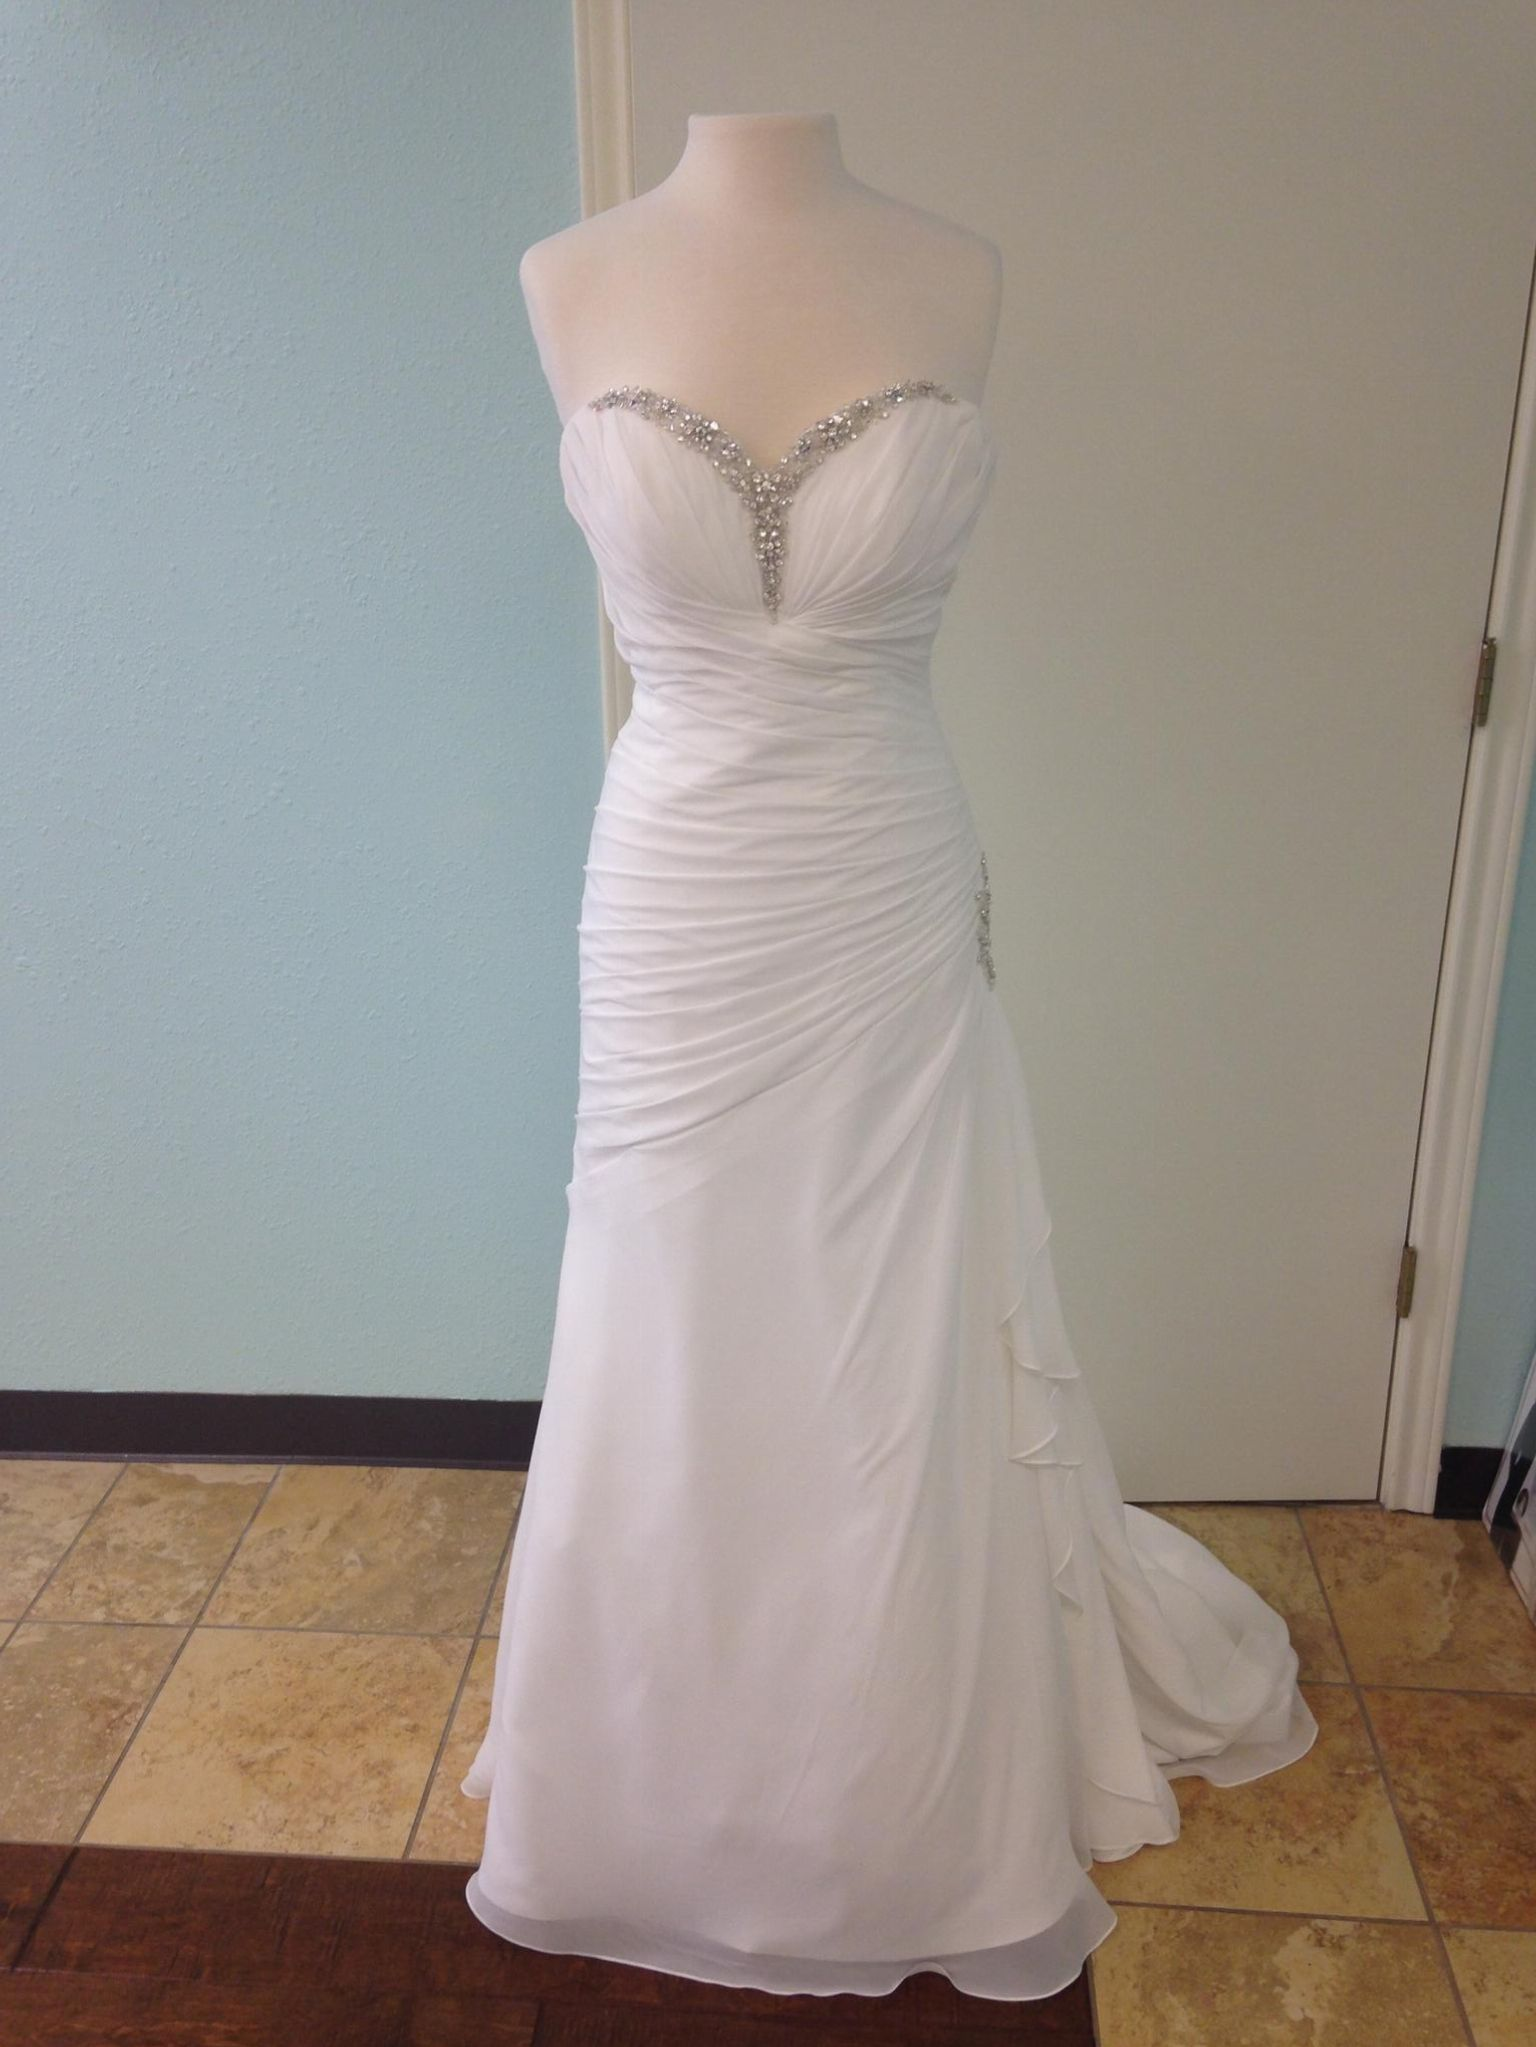 Moonlight Wedding Dress Sample, Size 12, 99 Wedding